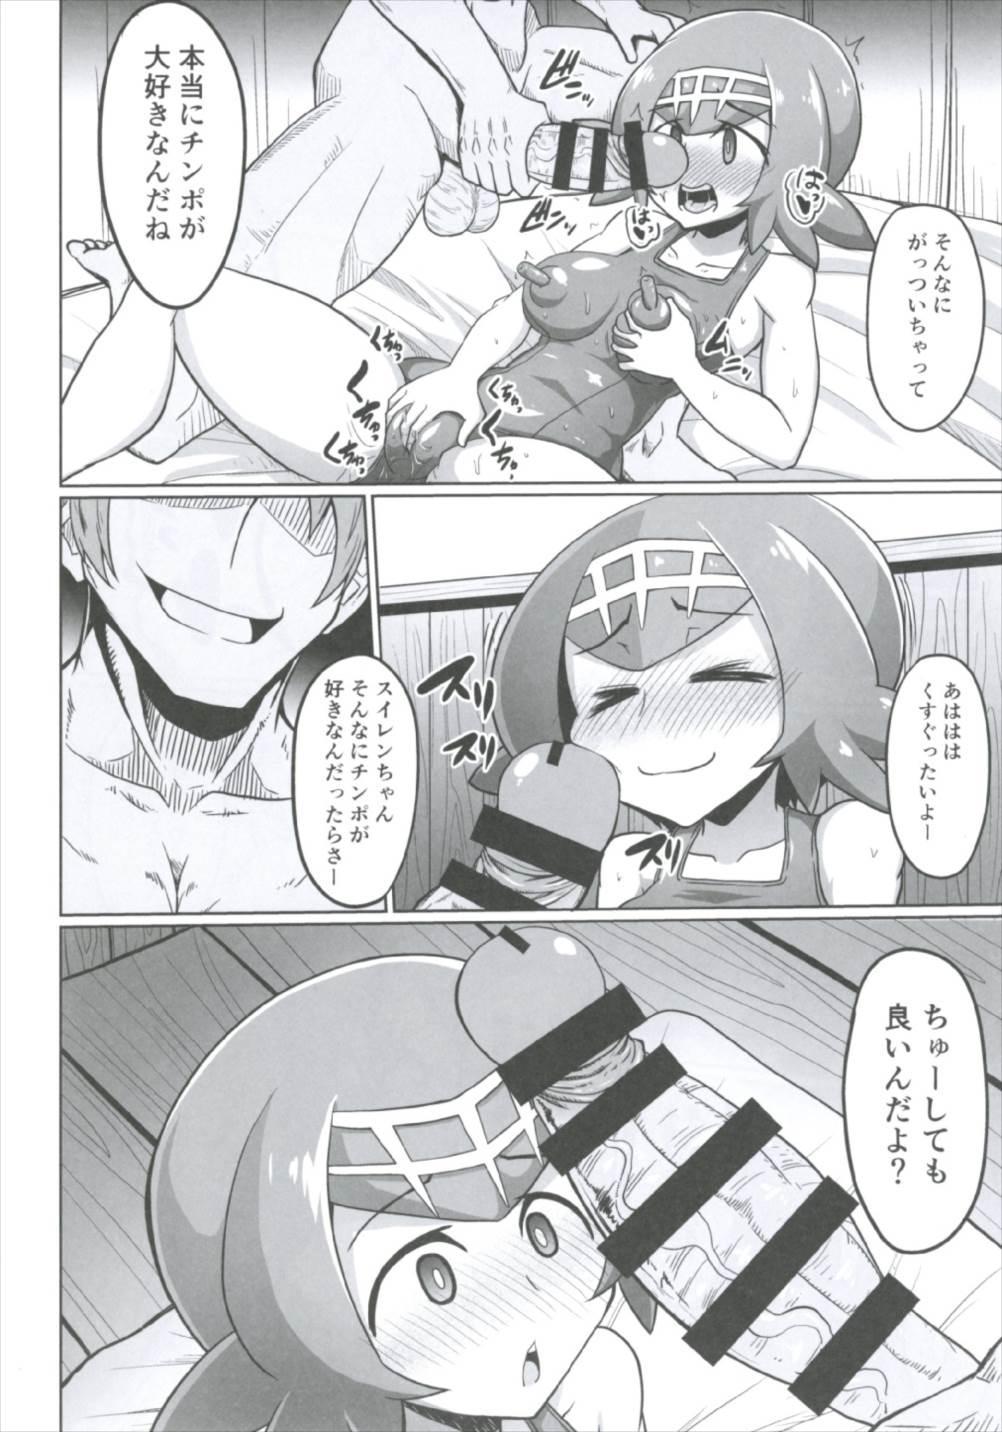 (C92) [Forever and ever (Eisen)] BOKKIMON -Suiren-chan wa H ni Kyoumi Shinshin- (Pokémon Sun and Moon) 15